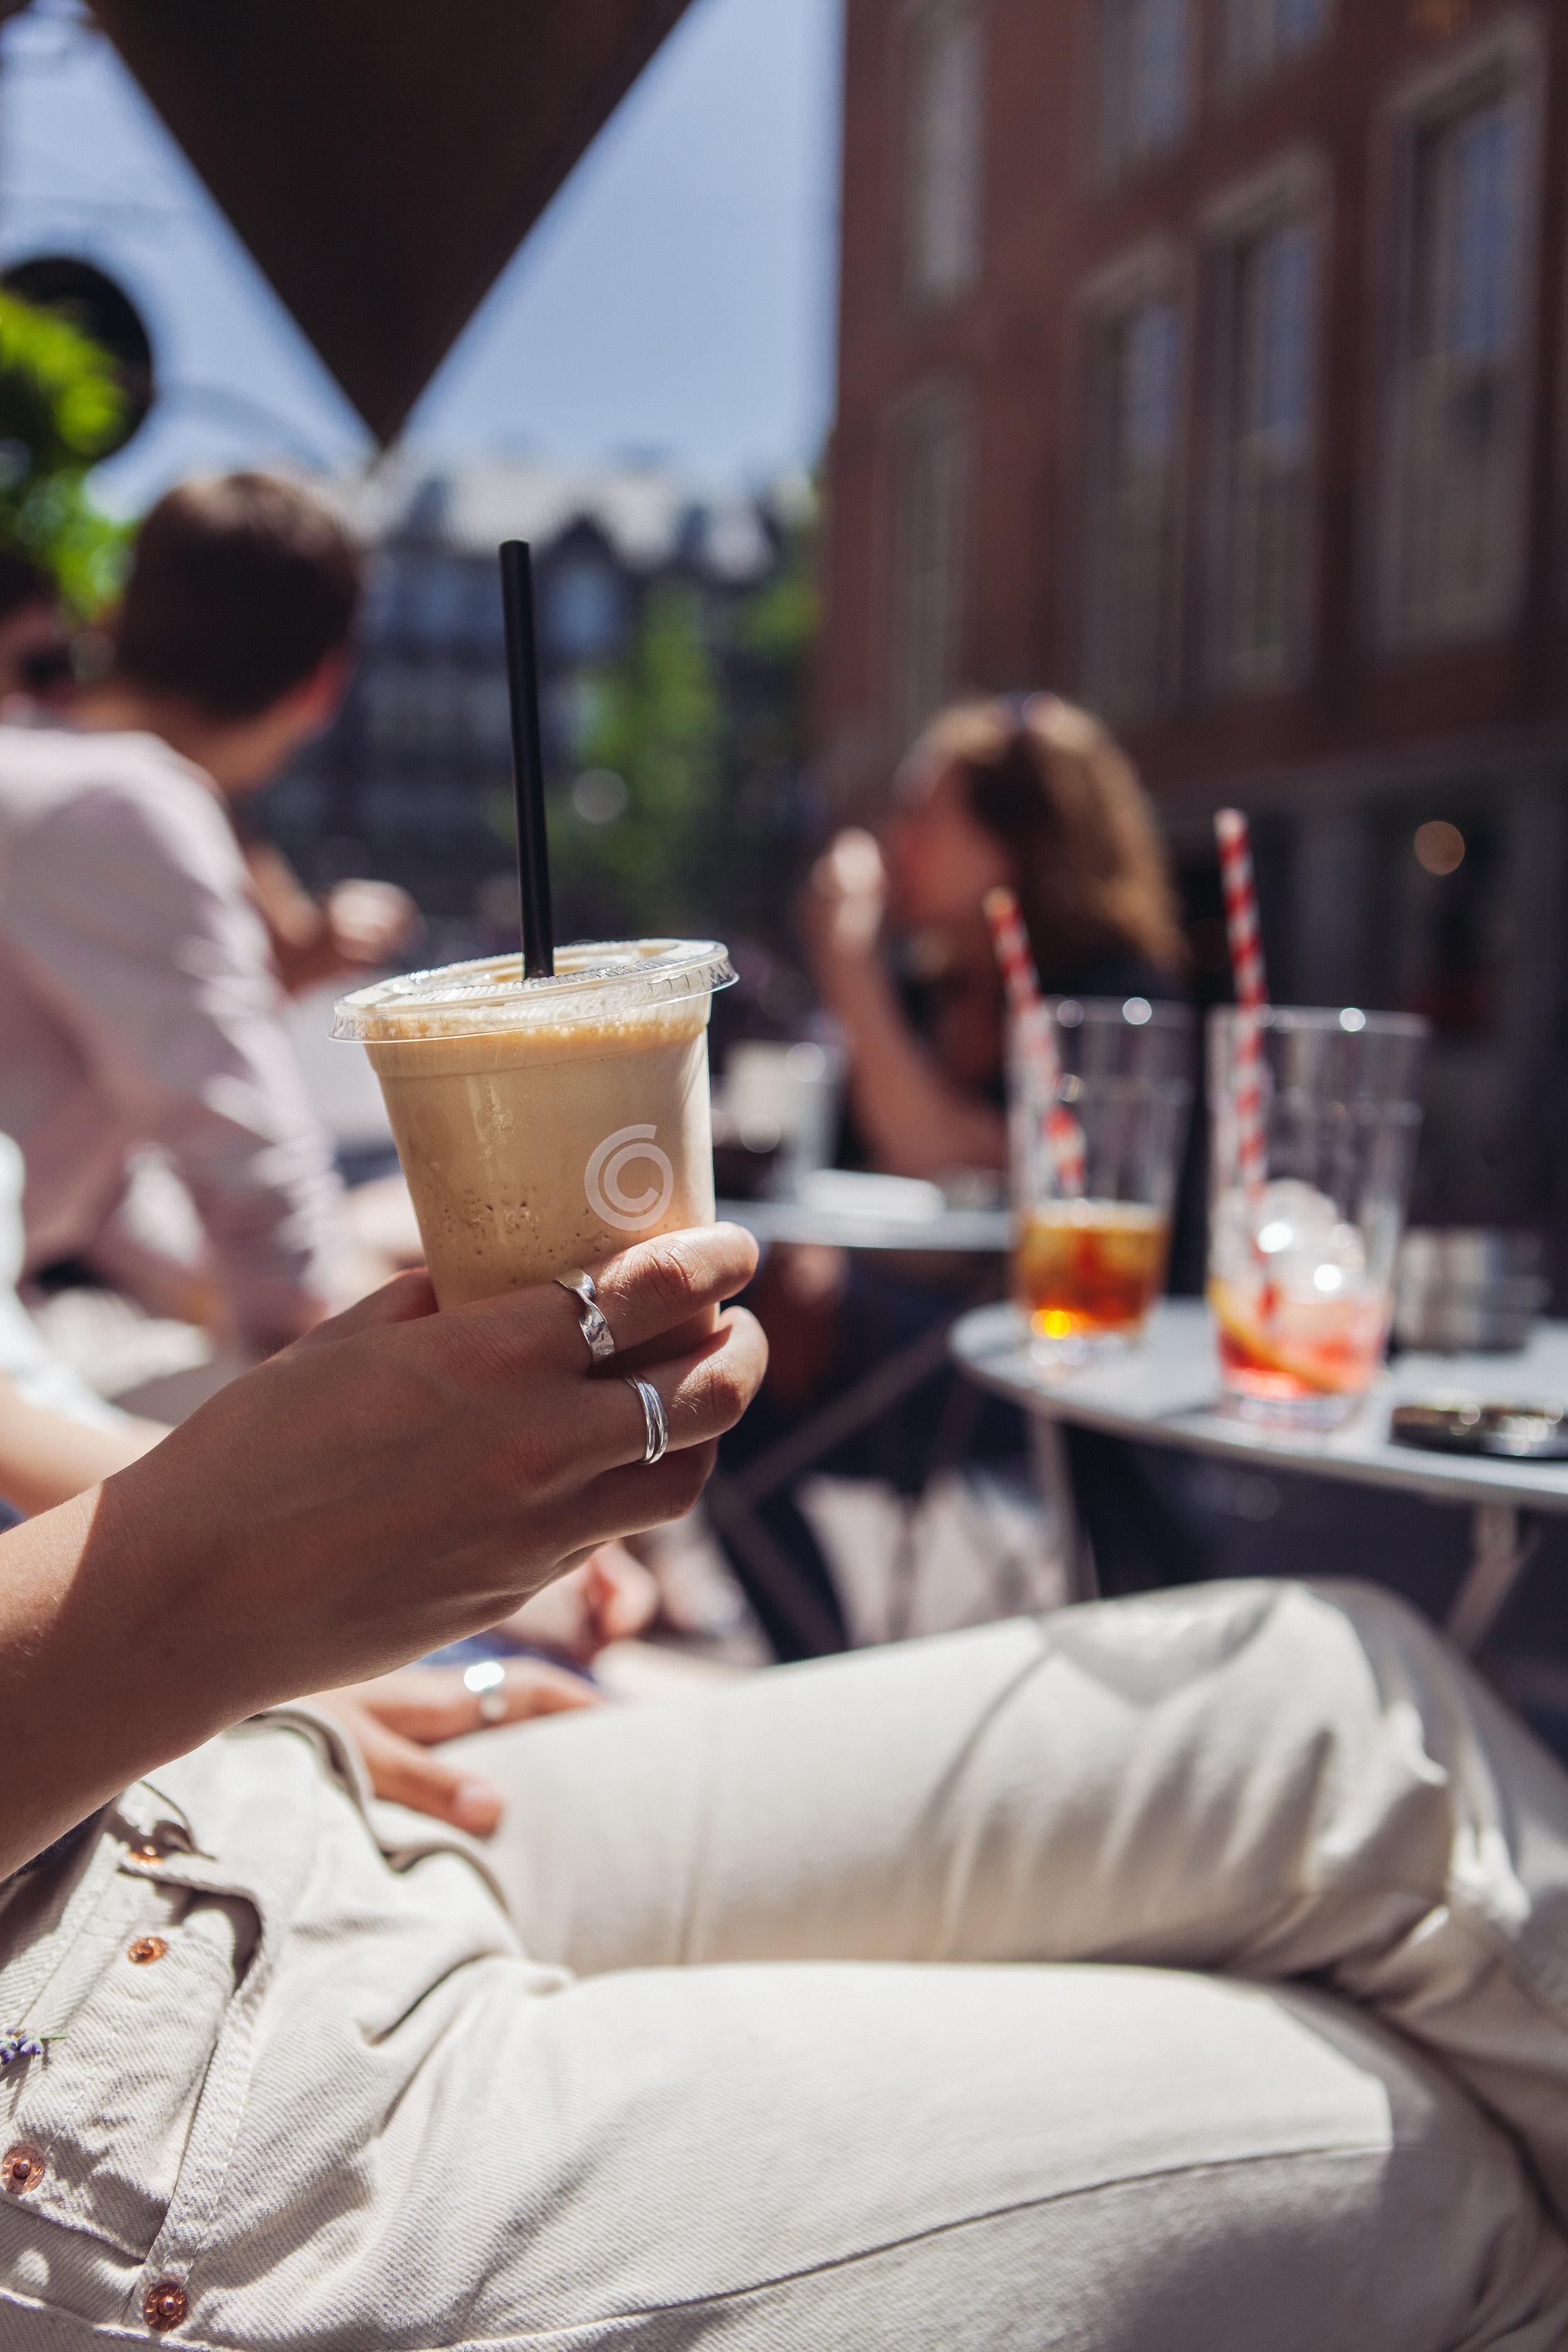 cc summerdrinks frozen cappuccino-104.jpg